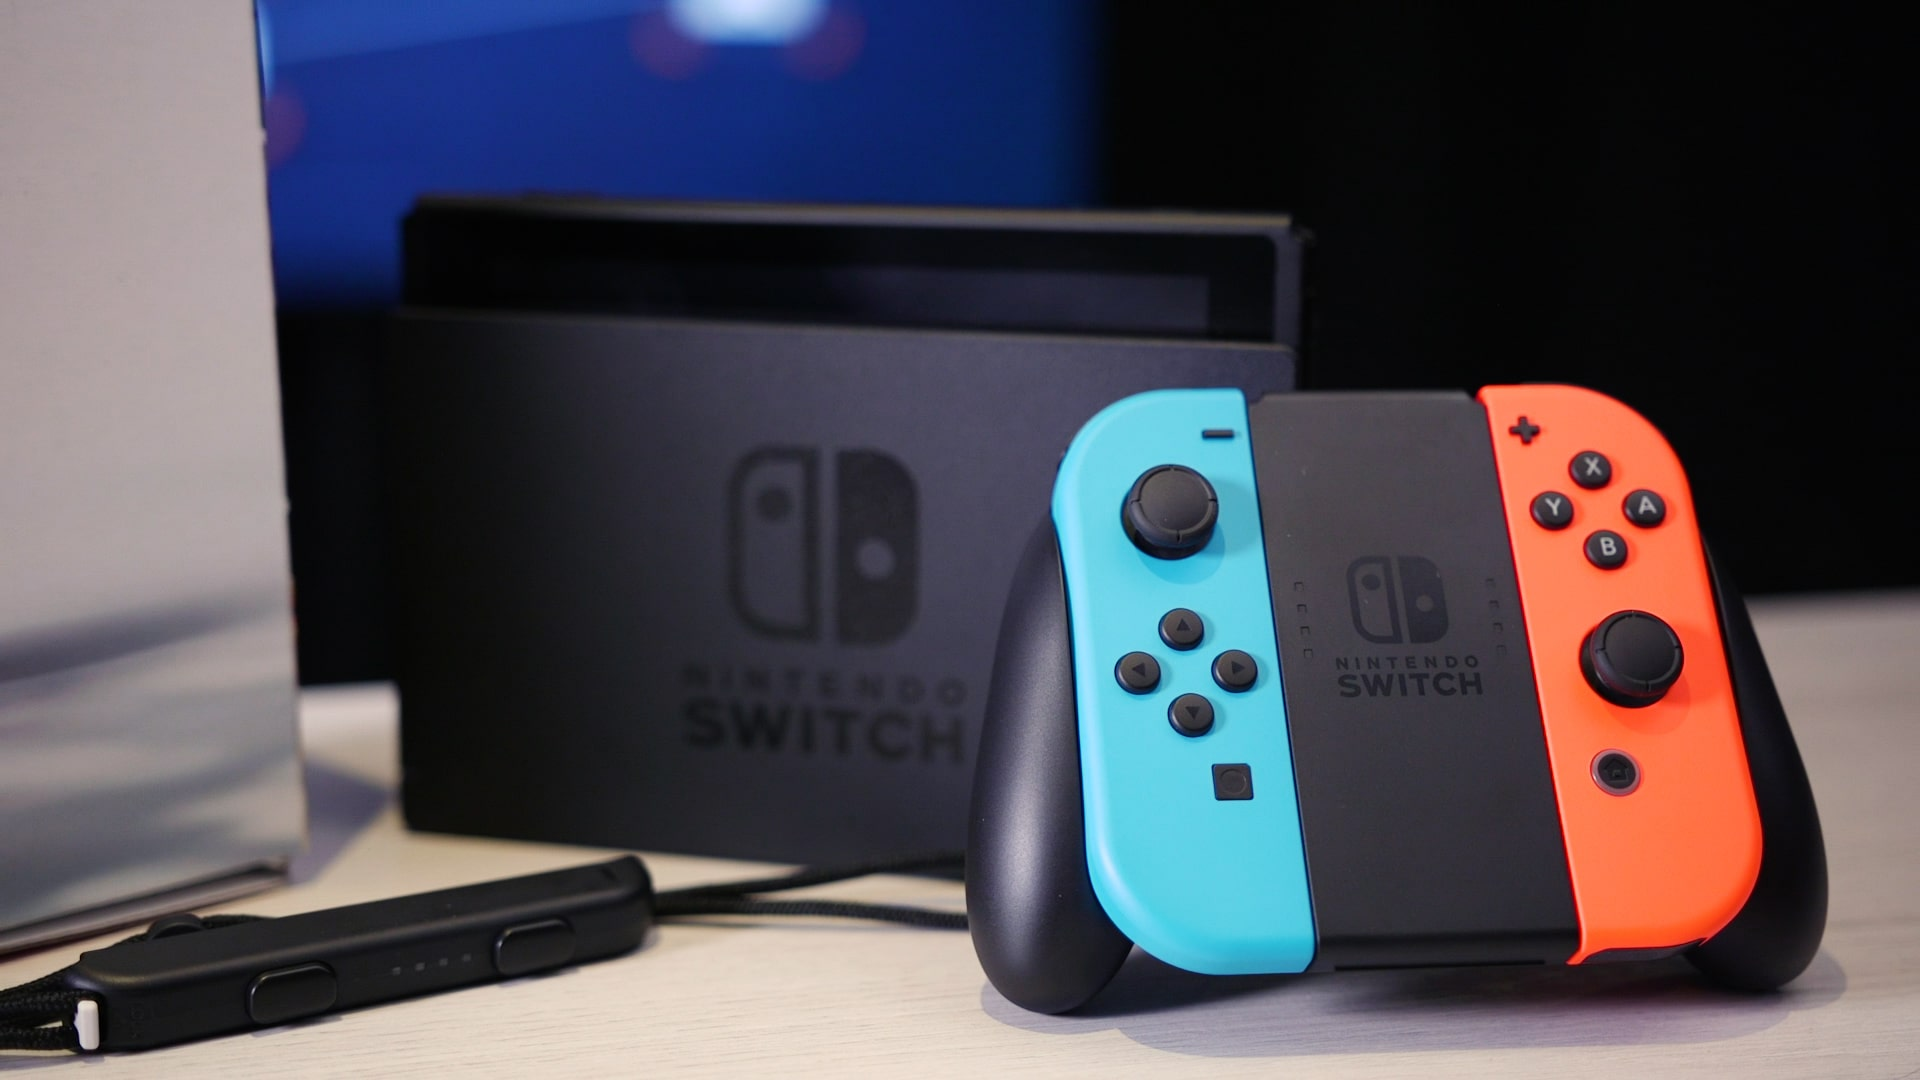 Qualcomm Nintendo Switch min-oyunpat